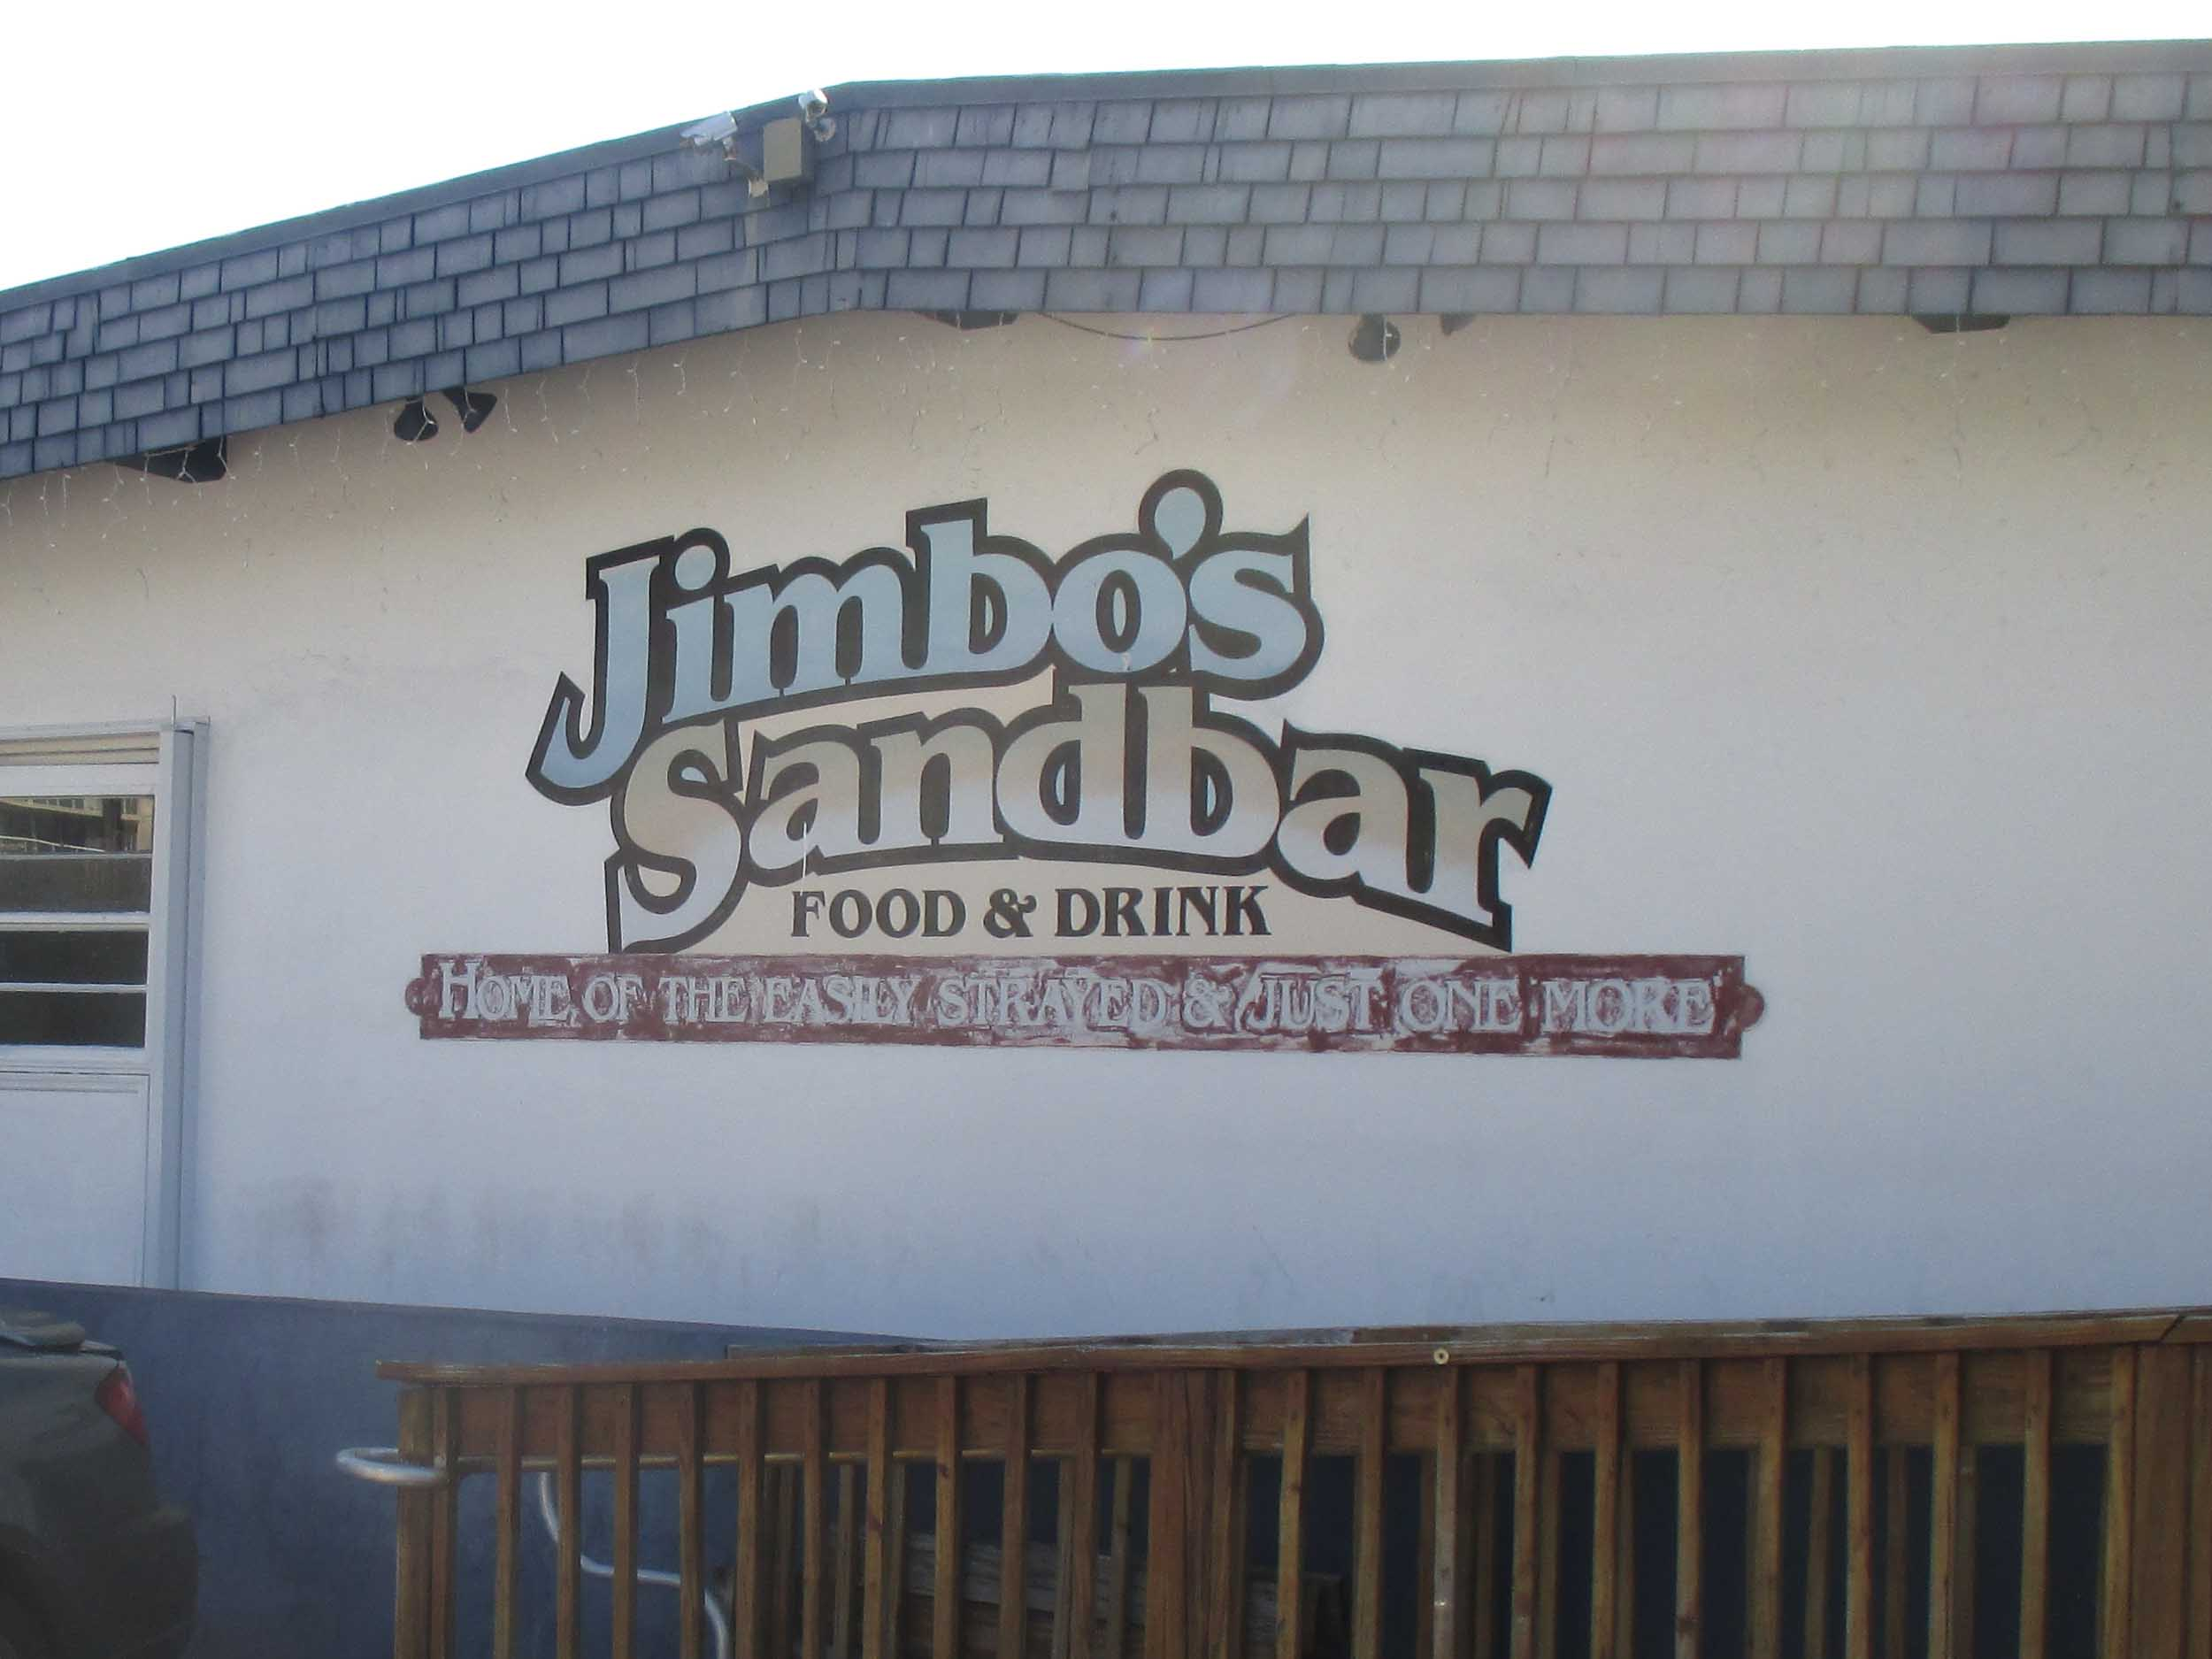 jimbos-sandbar-sign.jpg